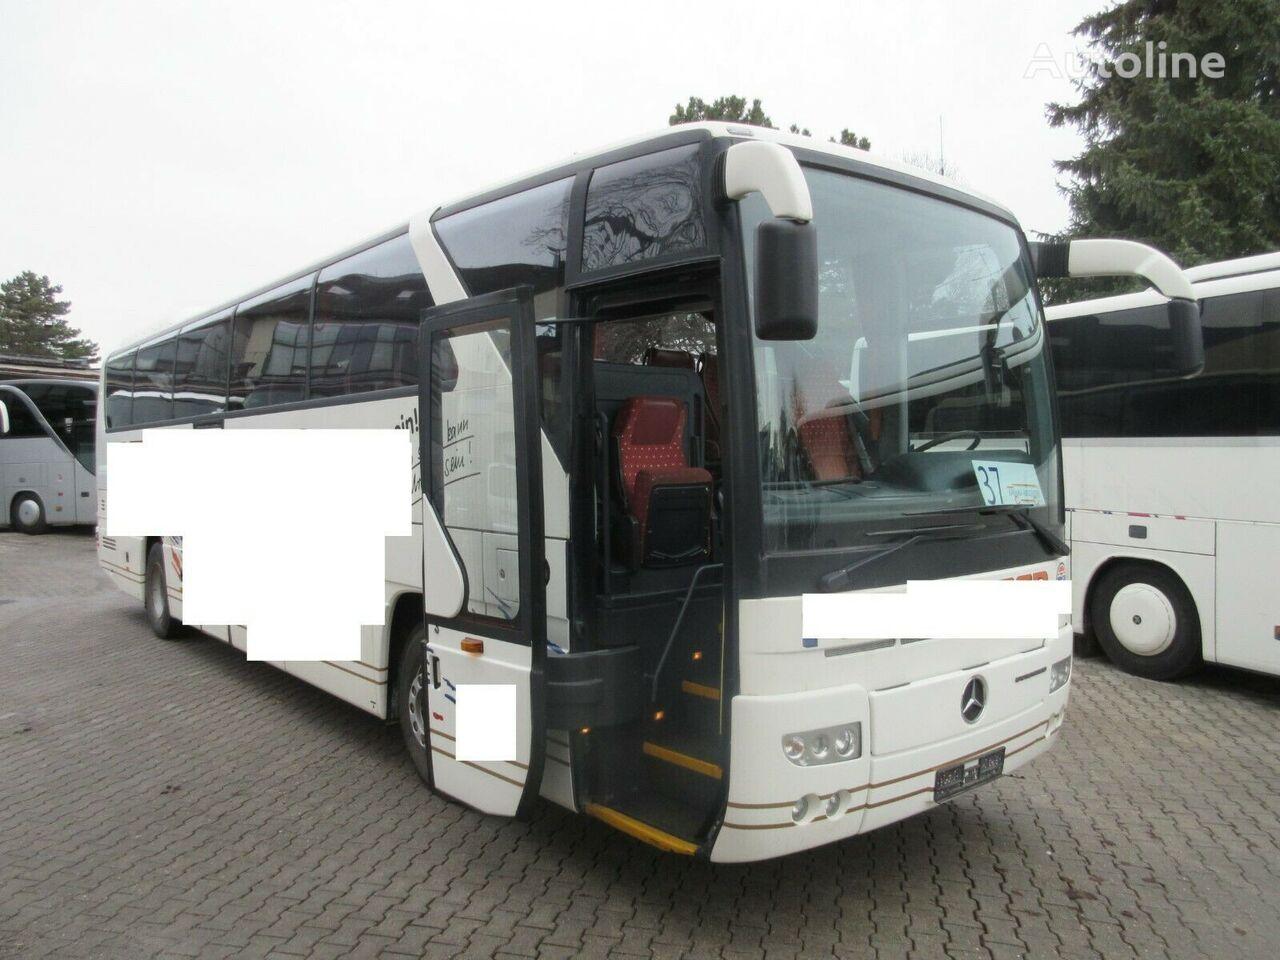 MERCEDES-BENZ Tourismo O 350 RHD/deutsches Fahrzeug coach bus